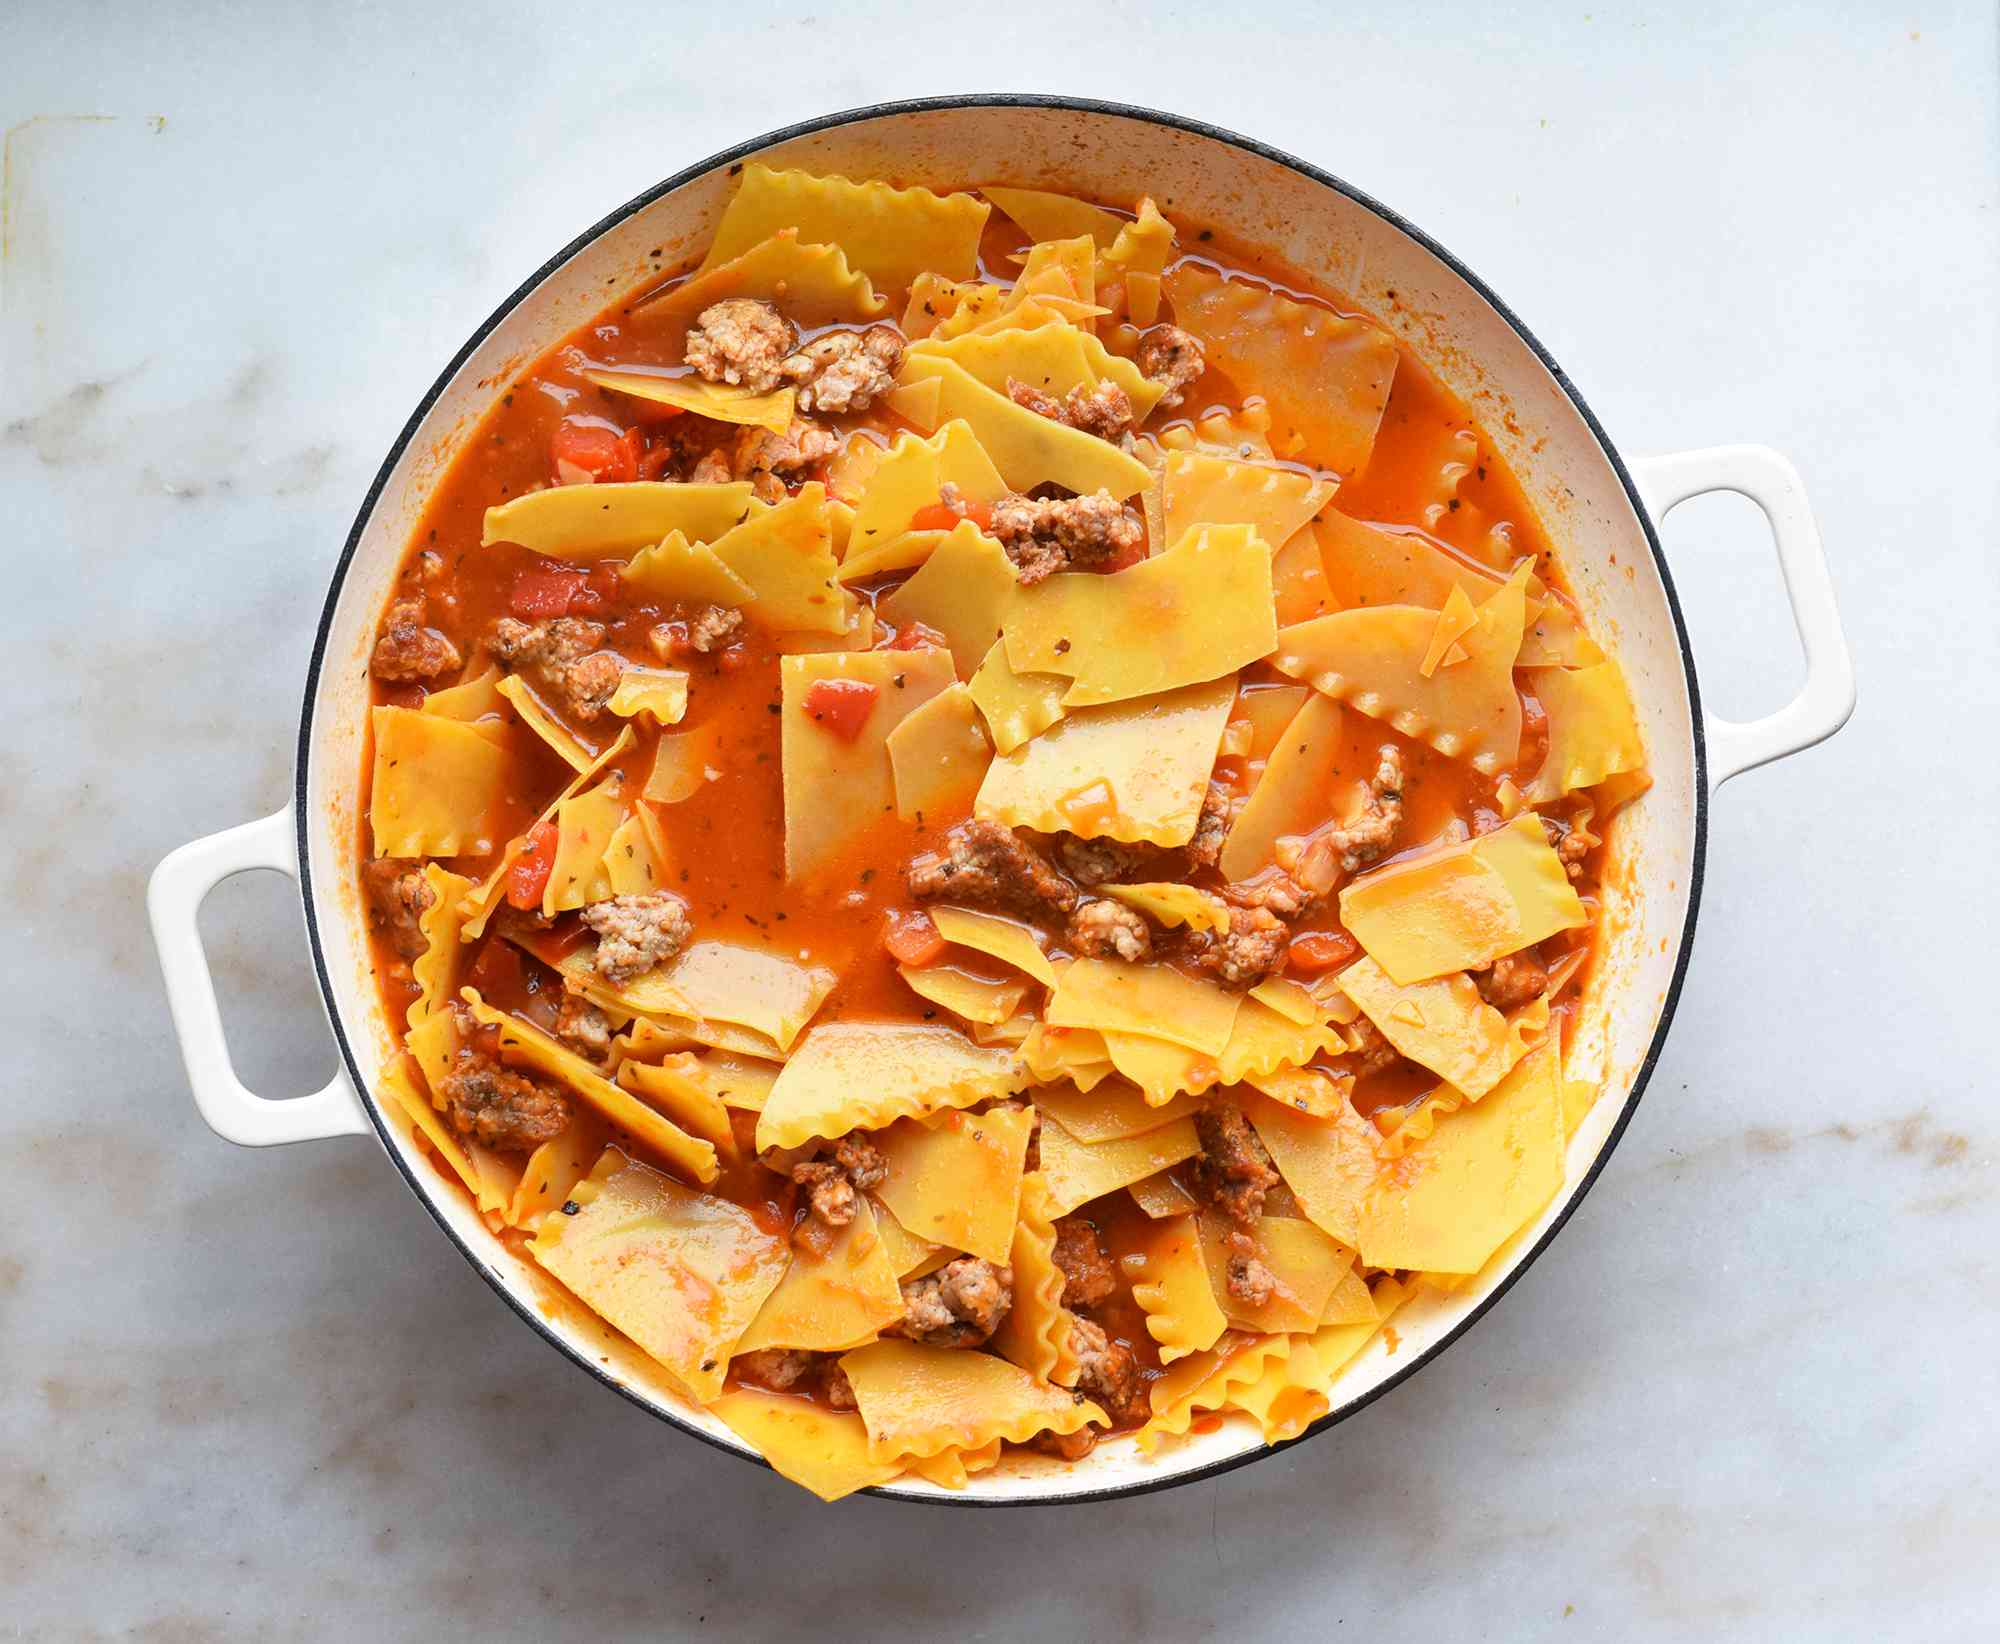 lasagna noodles in a sauce filled pan